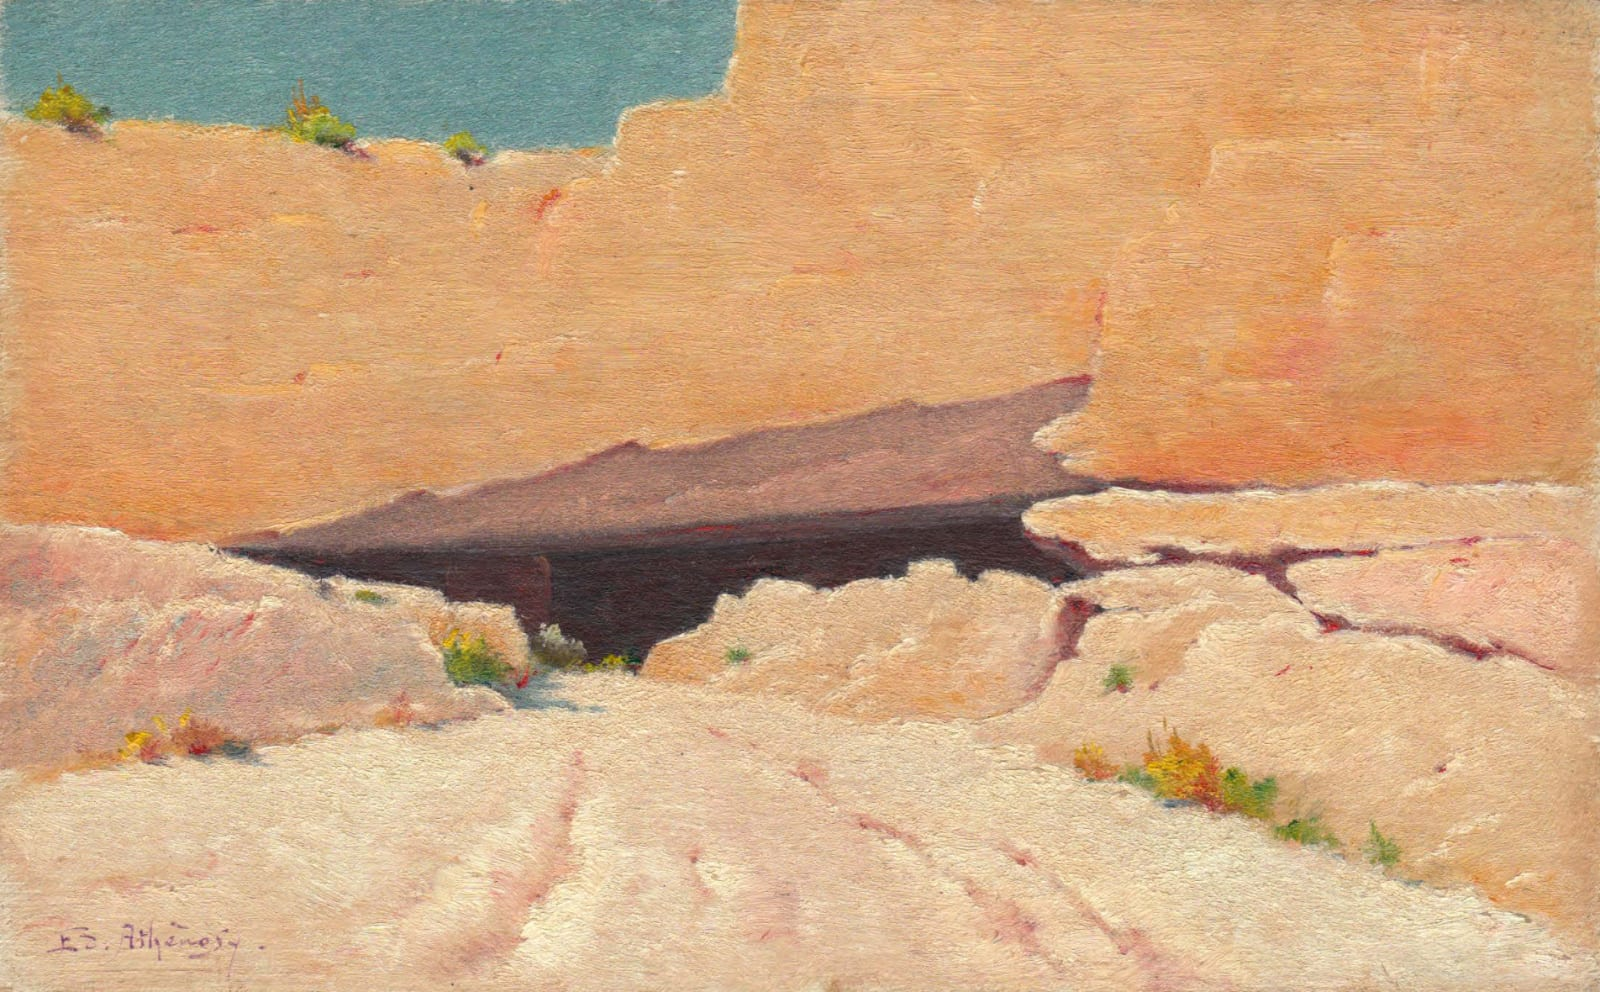 EDOUARD ATHÉNOSY, The entrance to the quarry, 1917